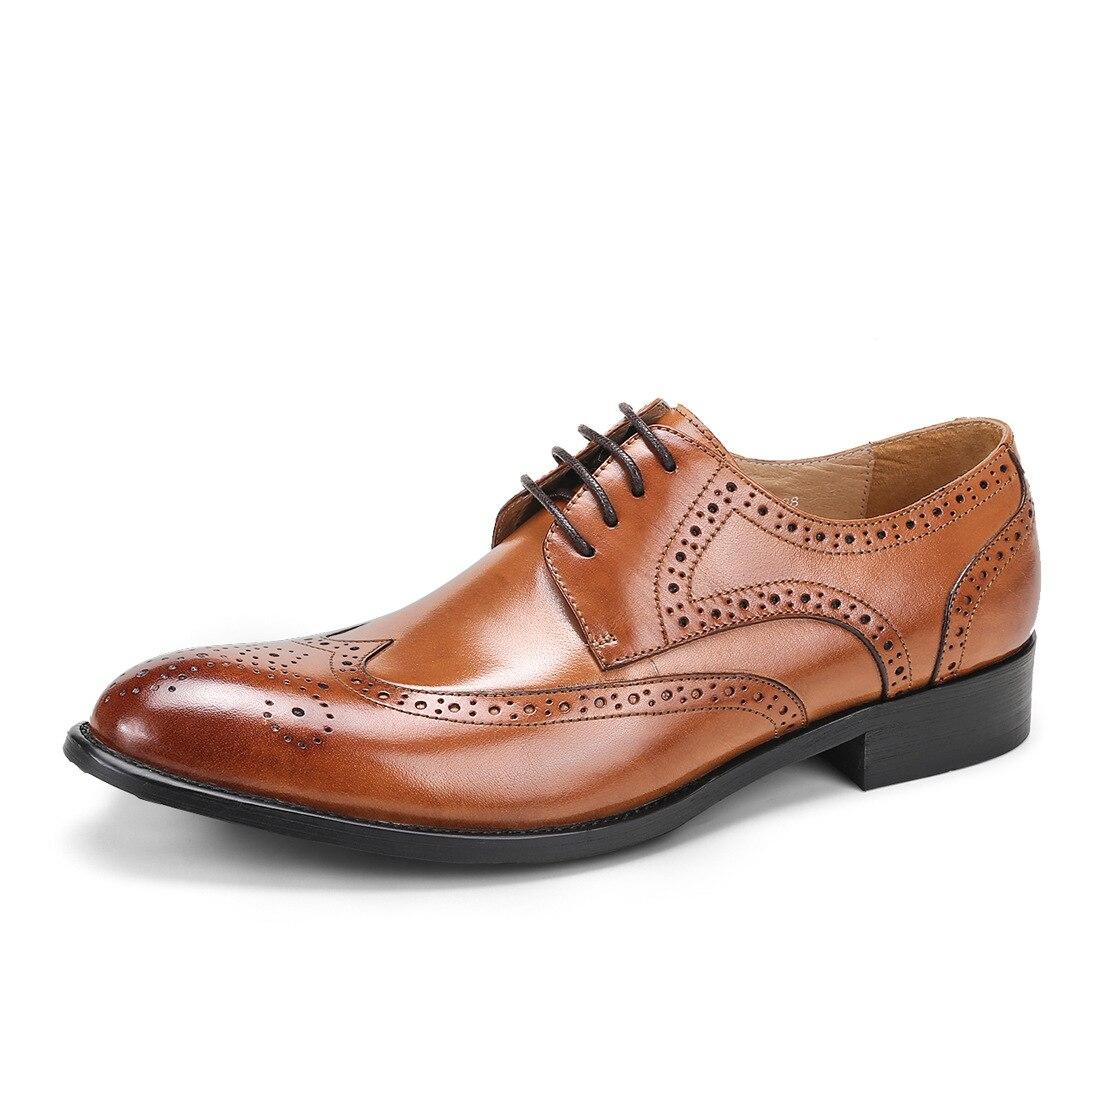 vintage rendas sapatos masculinos brogue oxford eua 11.5